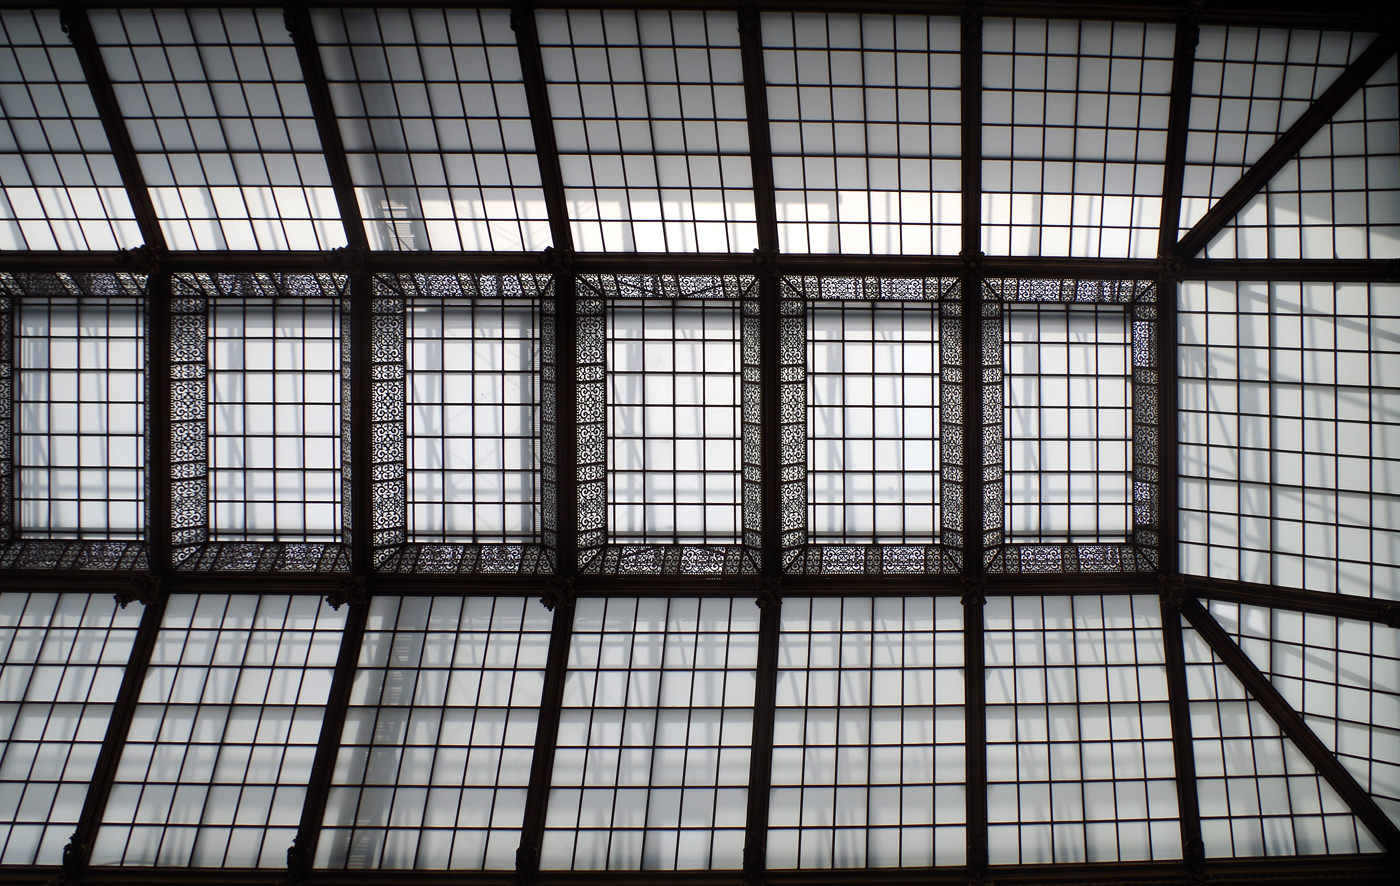 Justizpalast Wien - Glasdach der Aula - www.wien-erleben.com